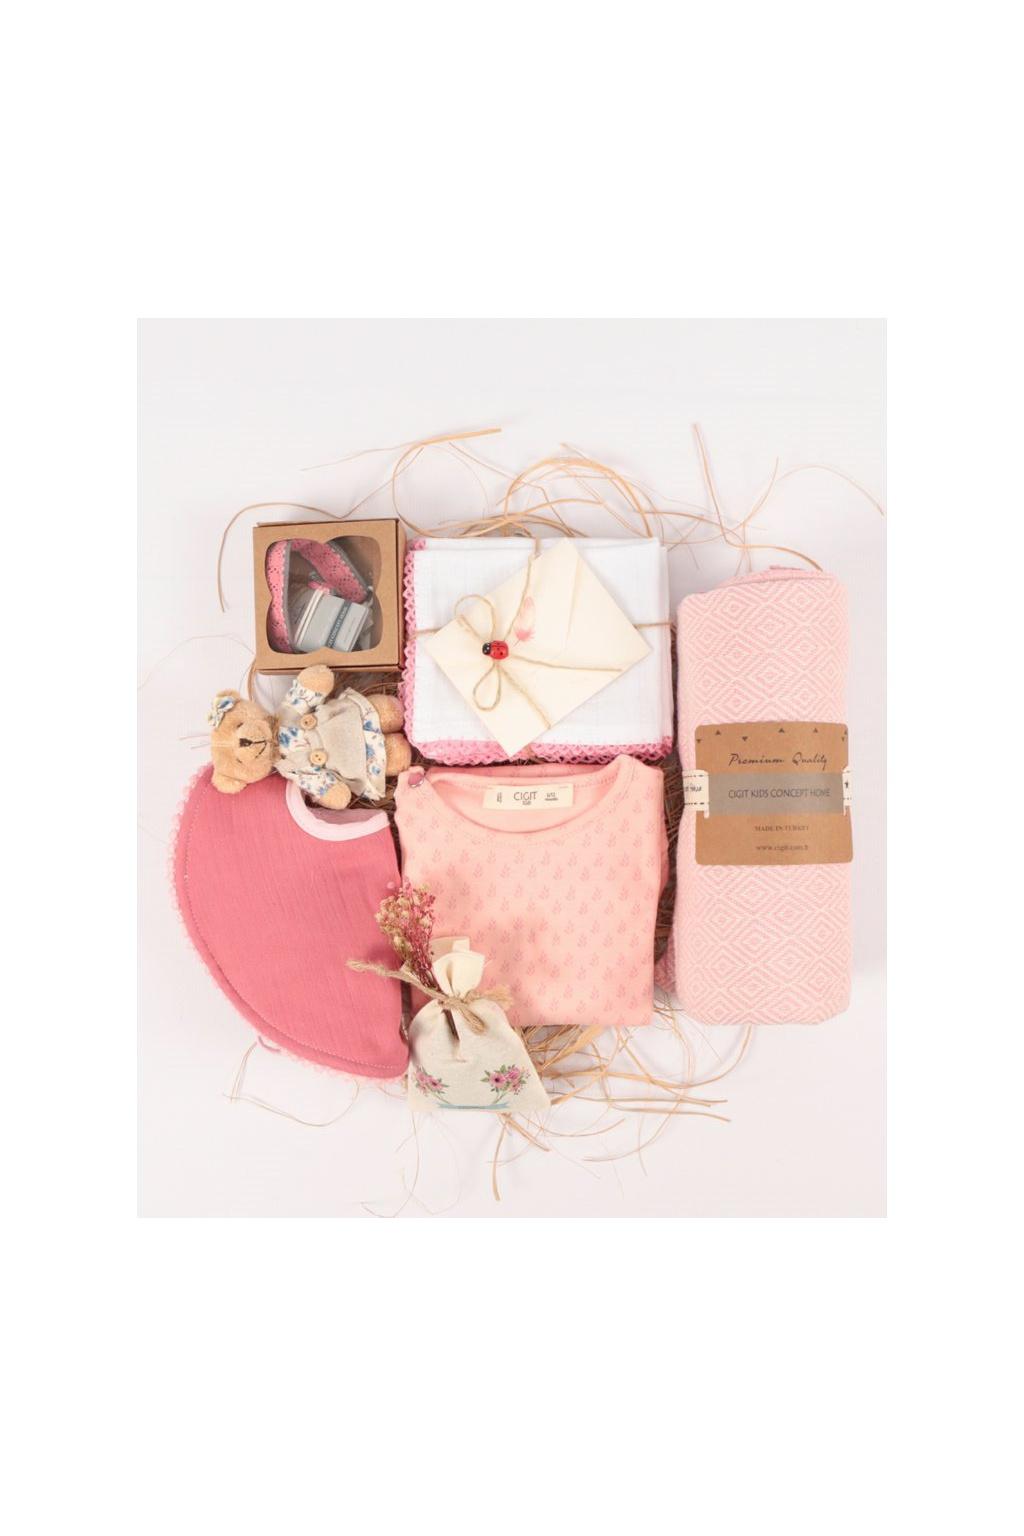 Cigit Premium růžový dárkový set pro holčičky2